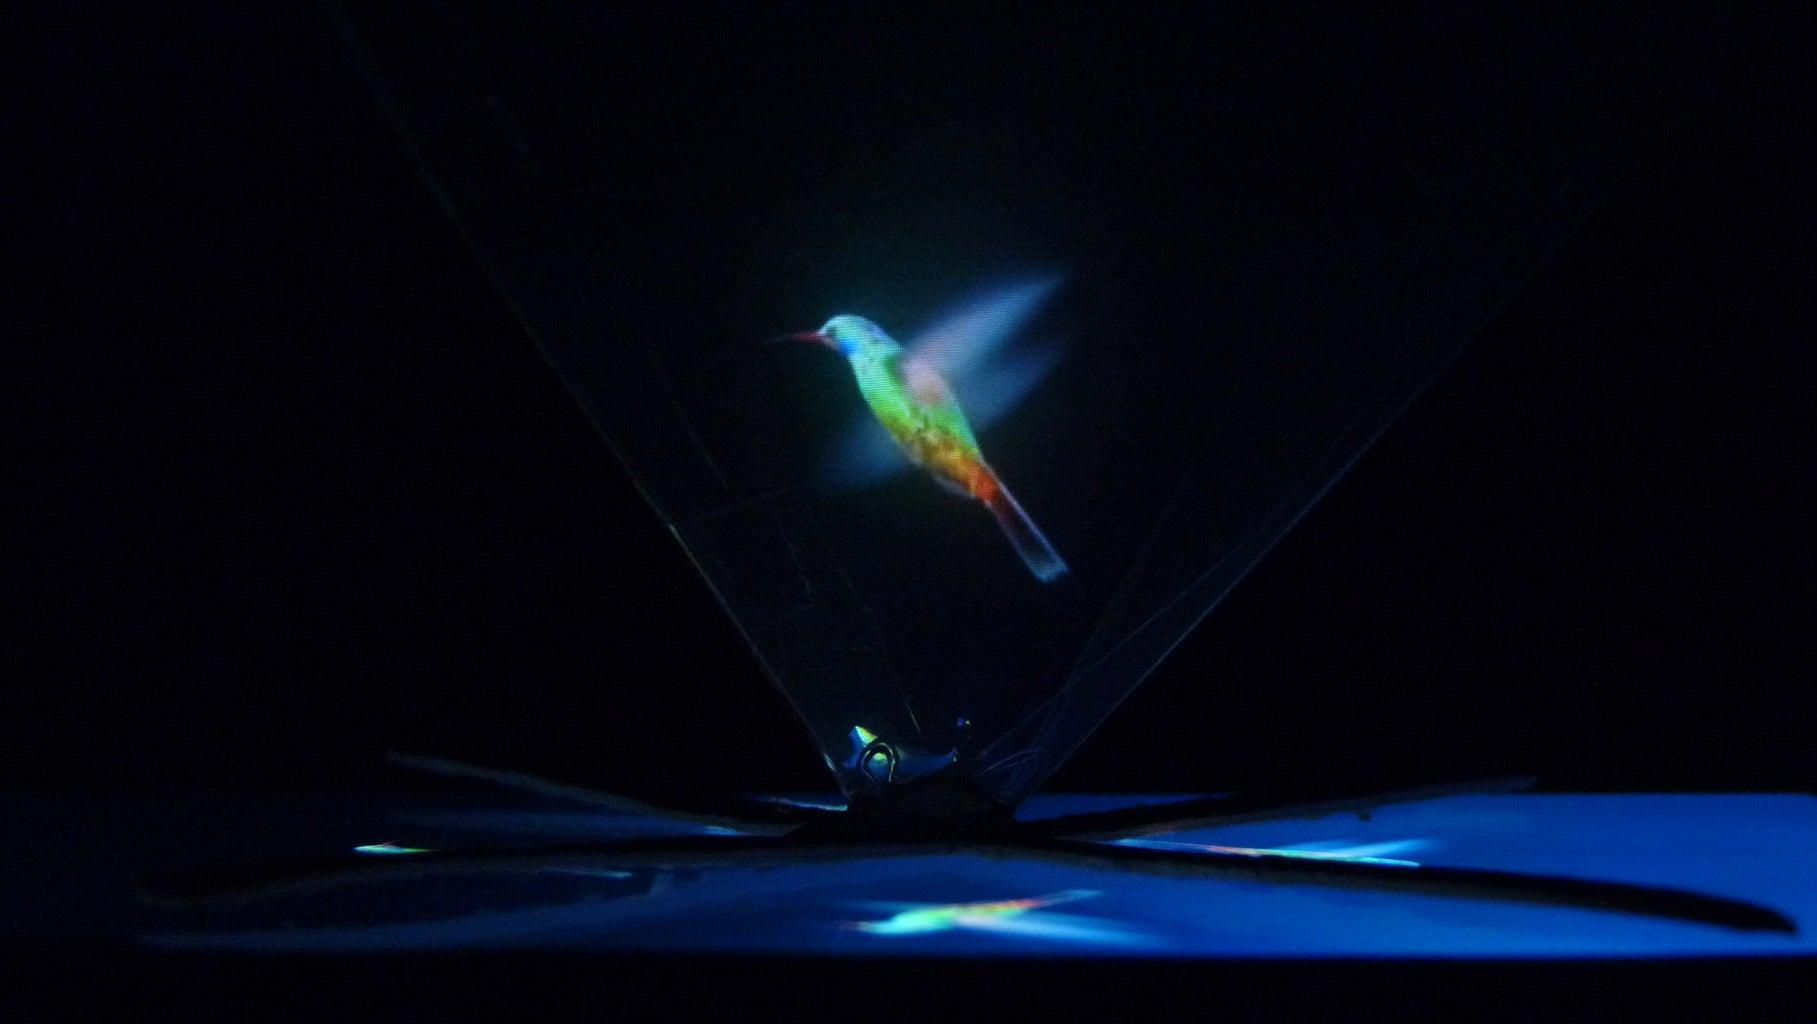 Enjoy the Hologram